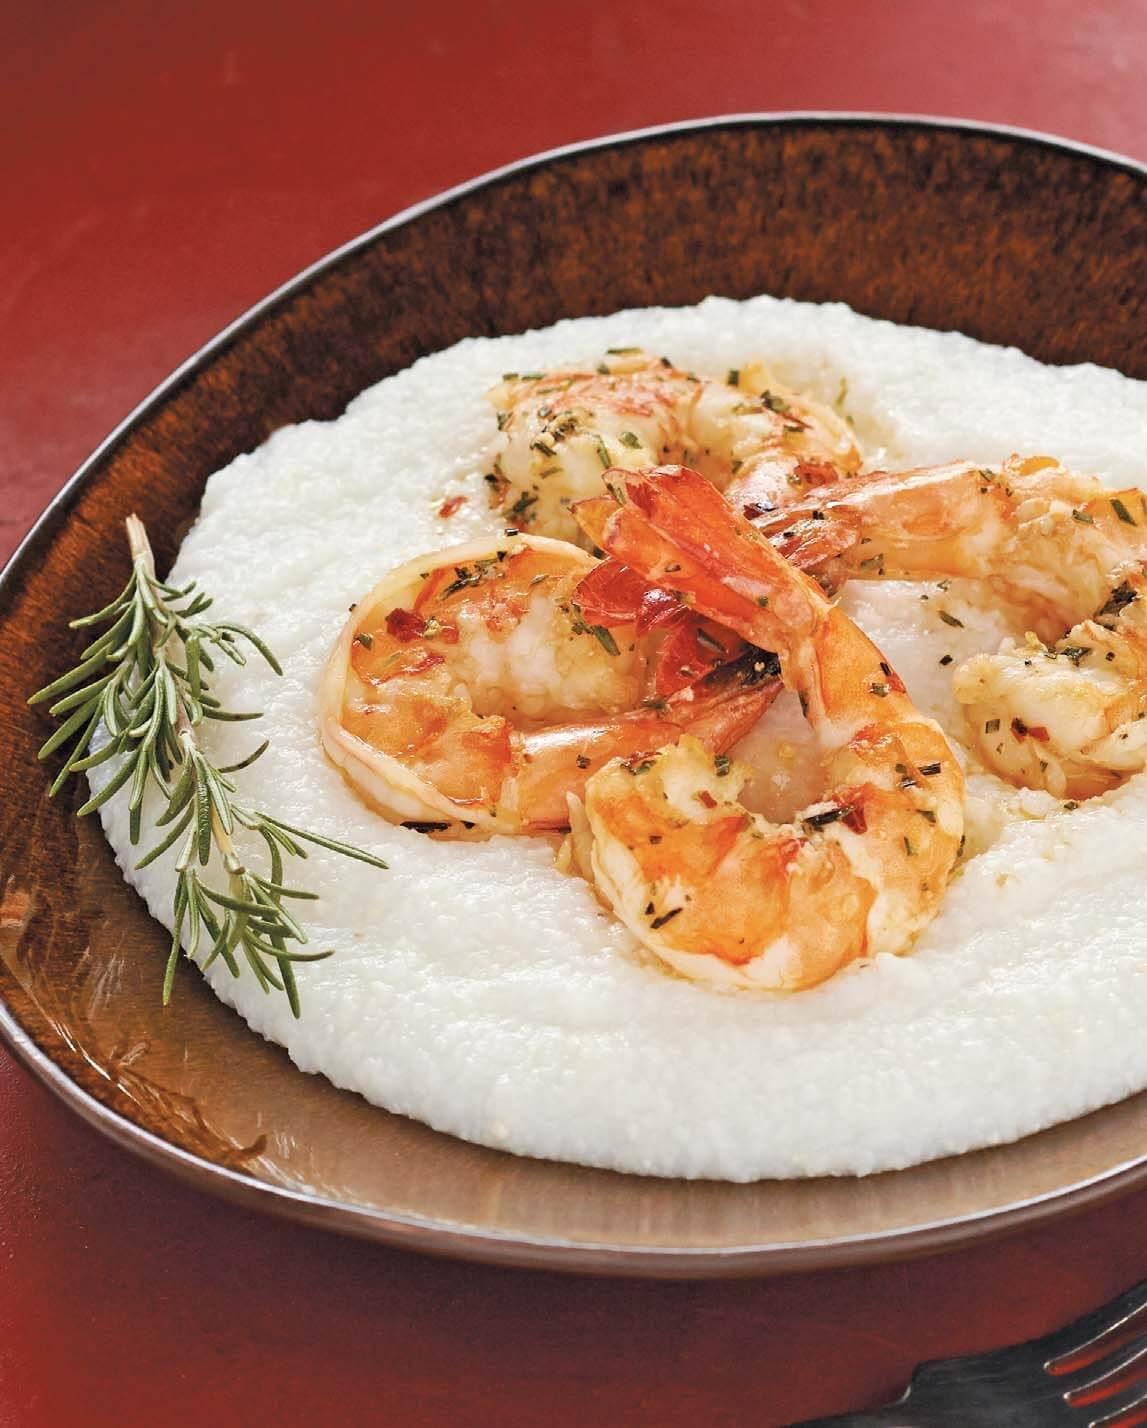 Sizzling Rosemary Shrimp over Polenta/Gamberi al rosmarino con polenta